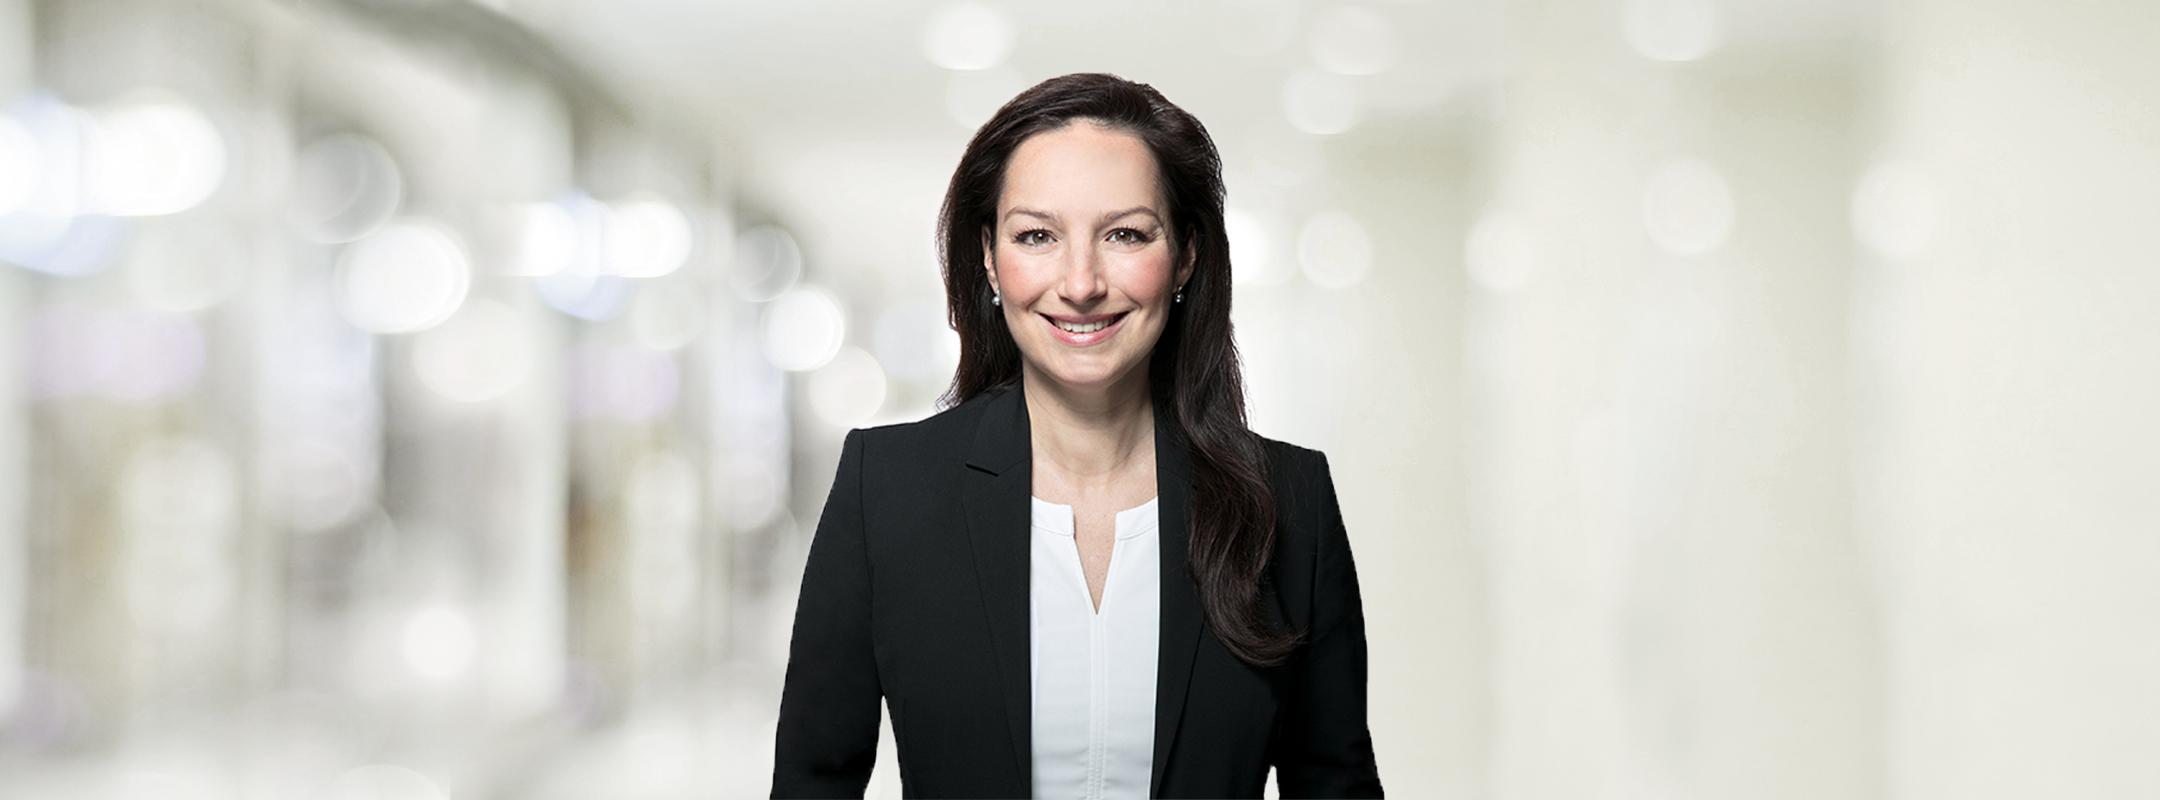 Linklaters-Partnerin Claudia Schneider